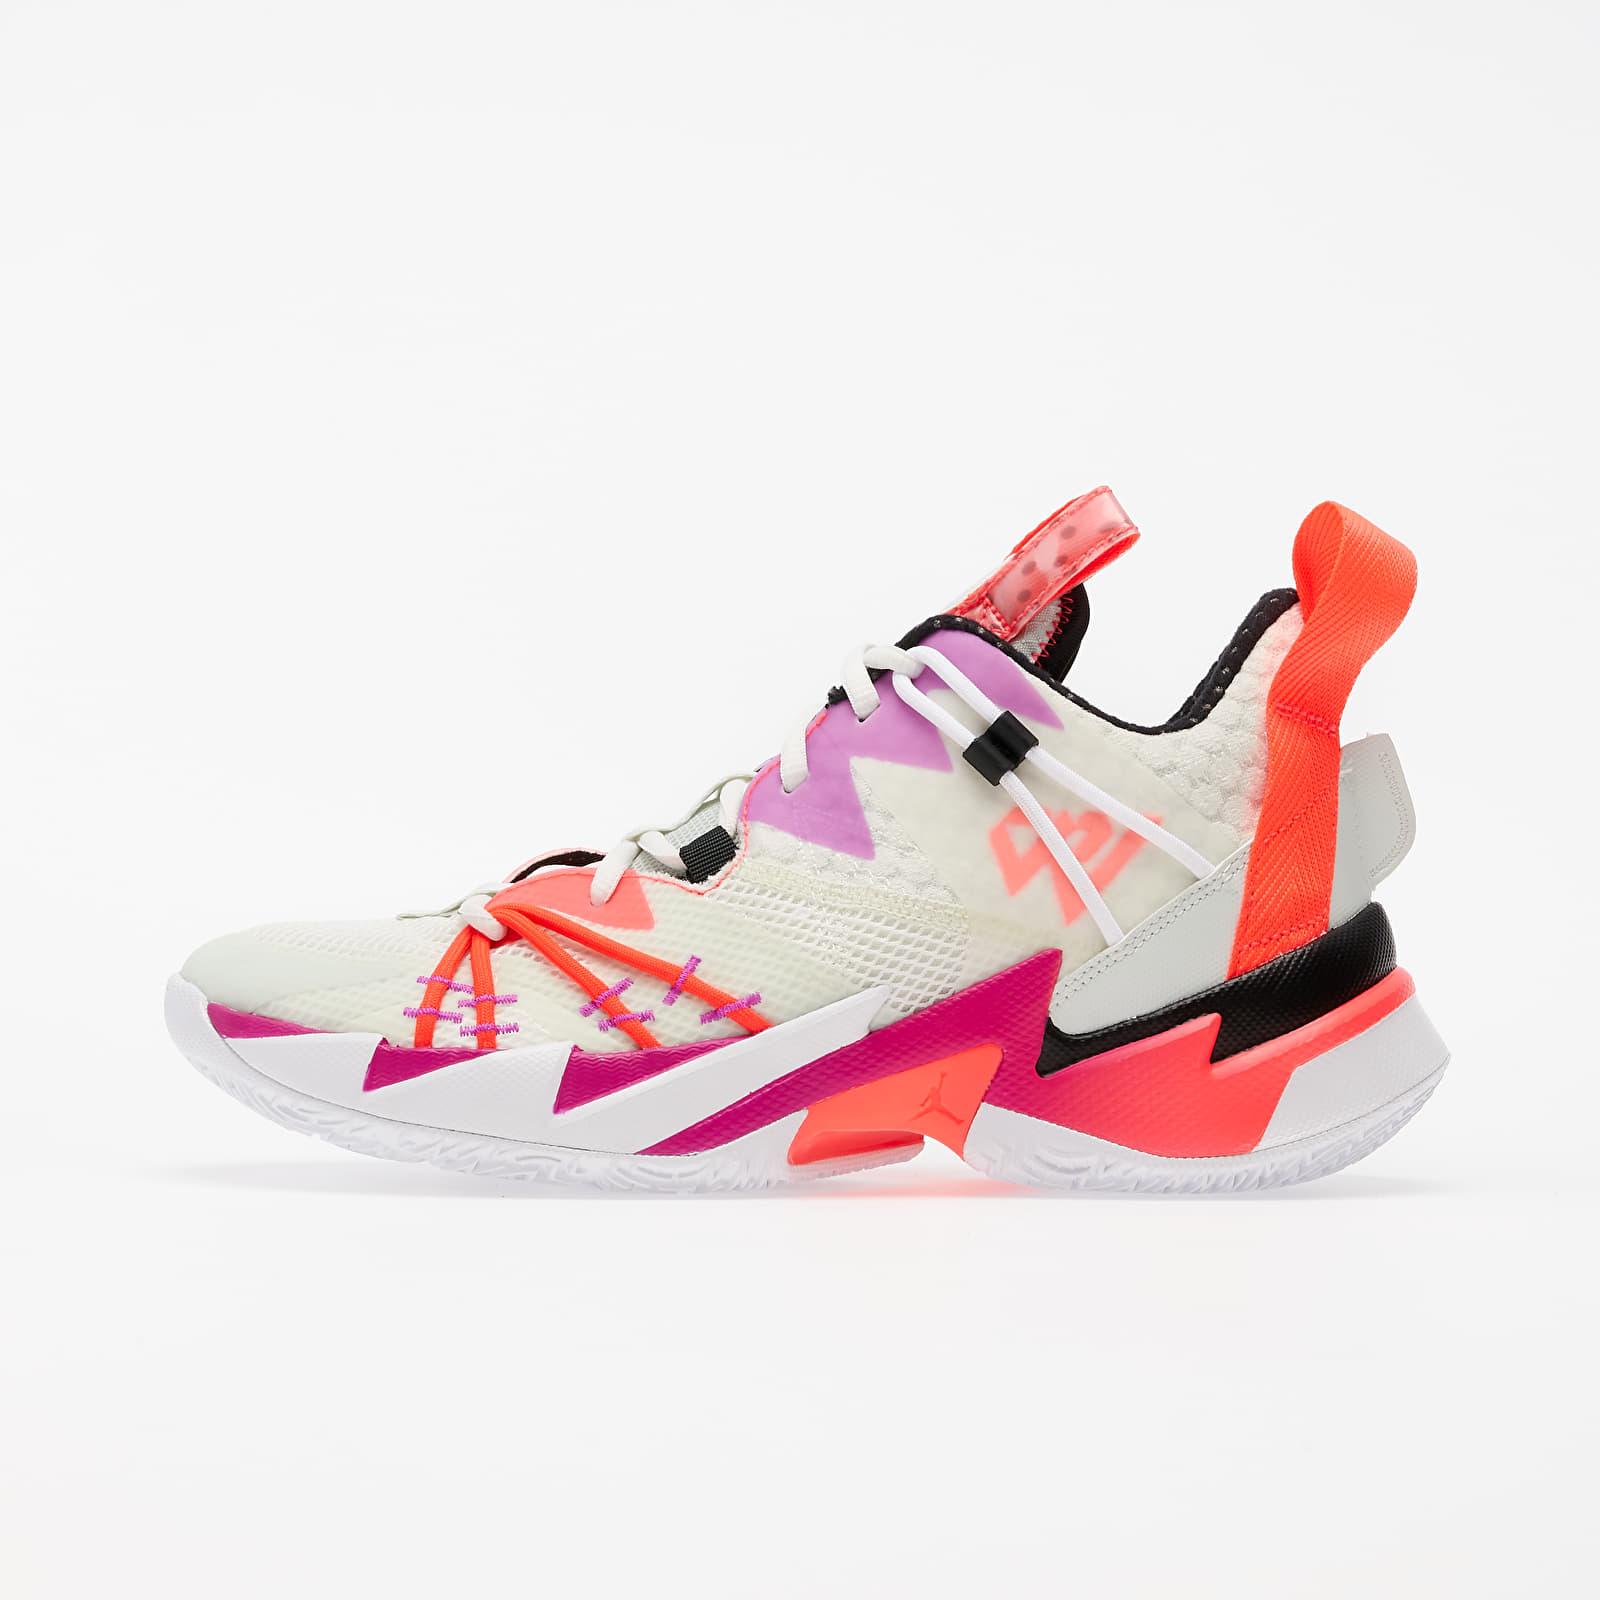 "Men's shoes Jordan ""Why Not?"" Zer0.3 SE Sail/ Black-Spruce Aura-Flash Crimson"